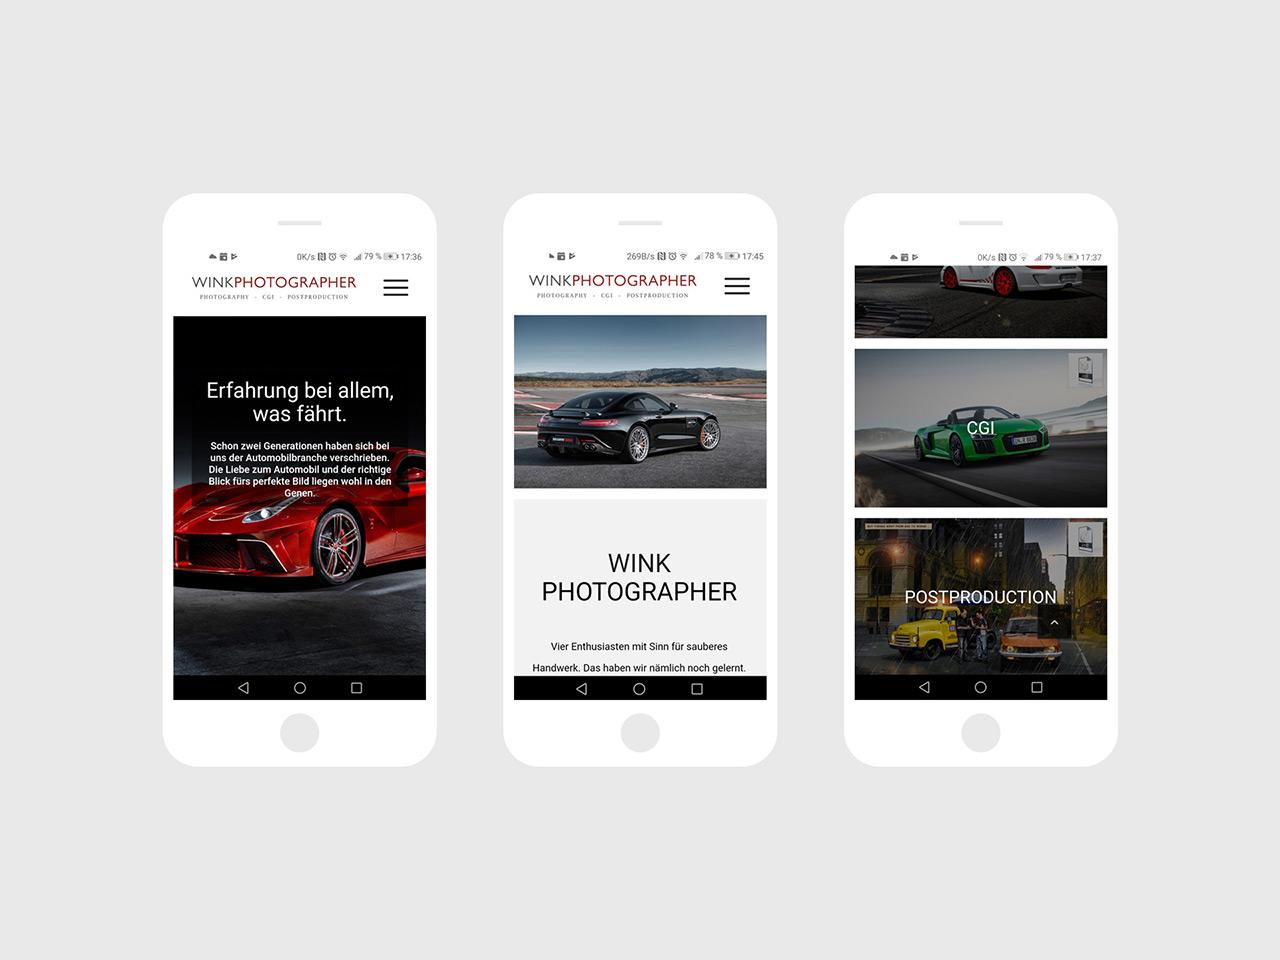 mcks-wink-webseite-mobil